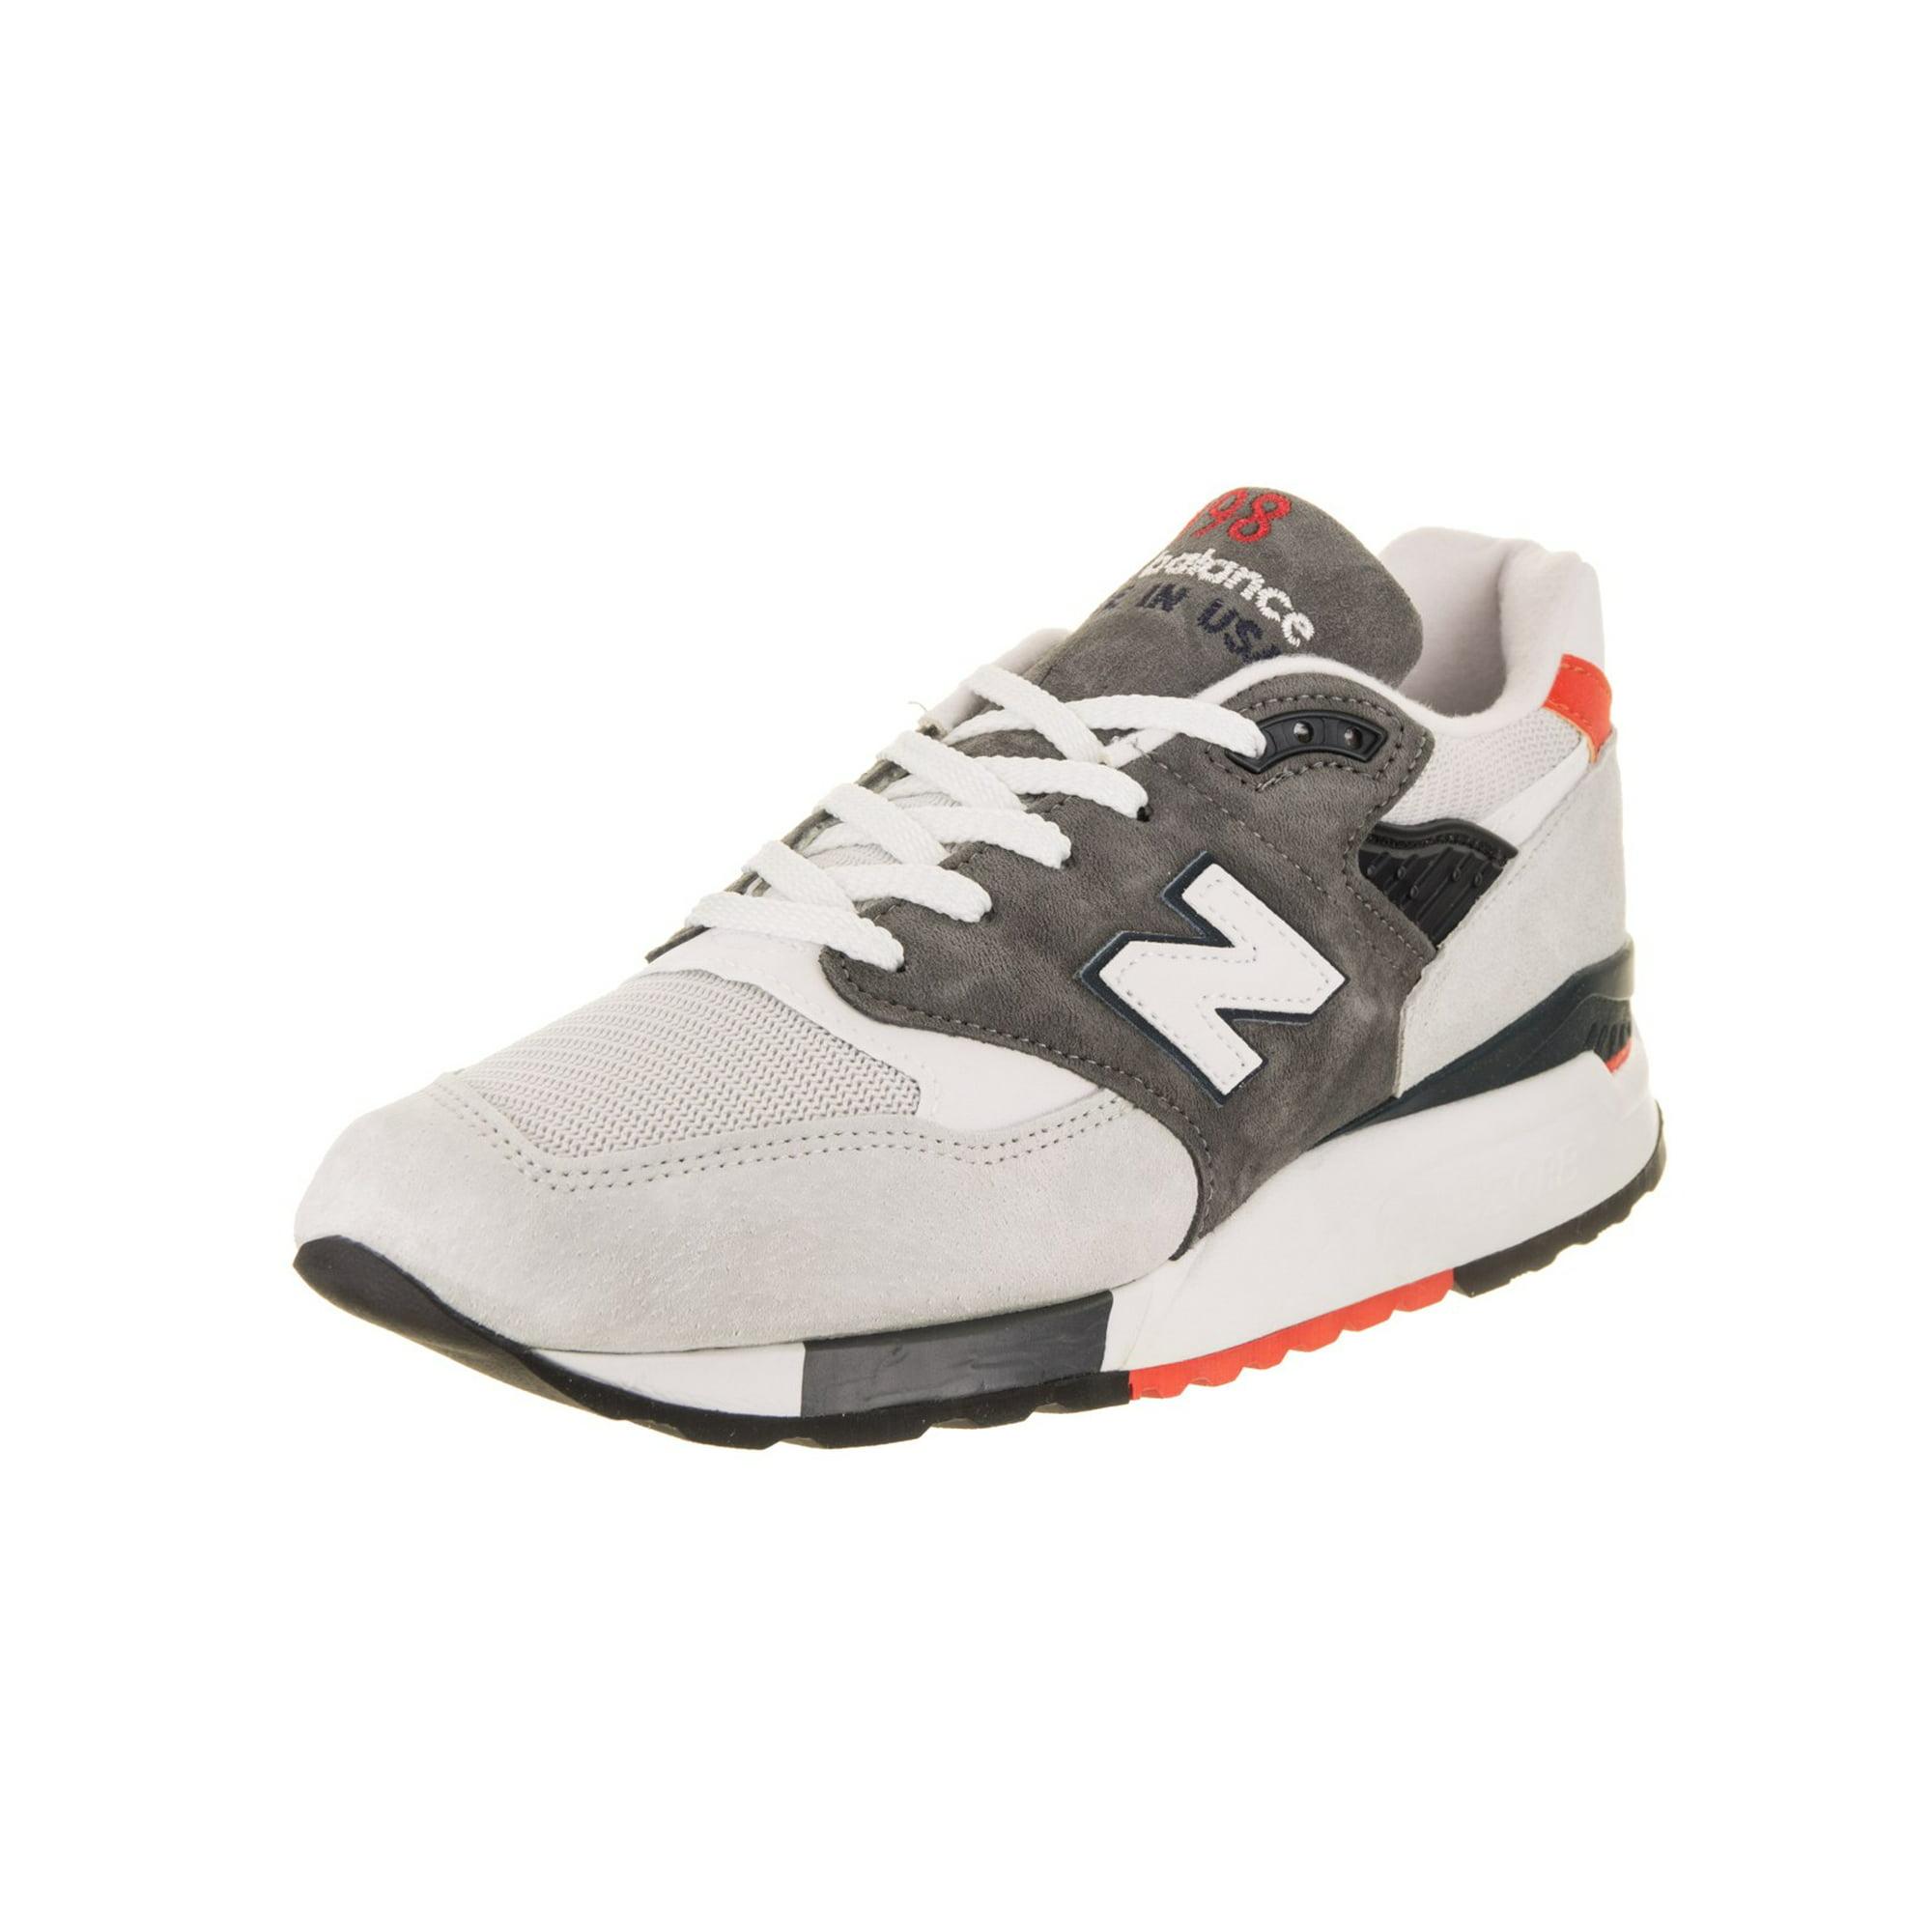 buy popular d815e 0d03d New Balance Men's 998 Classics Running Shoe